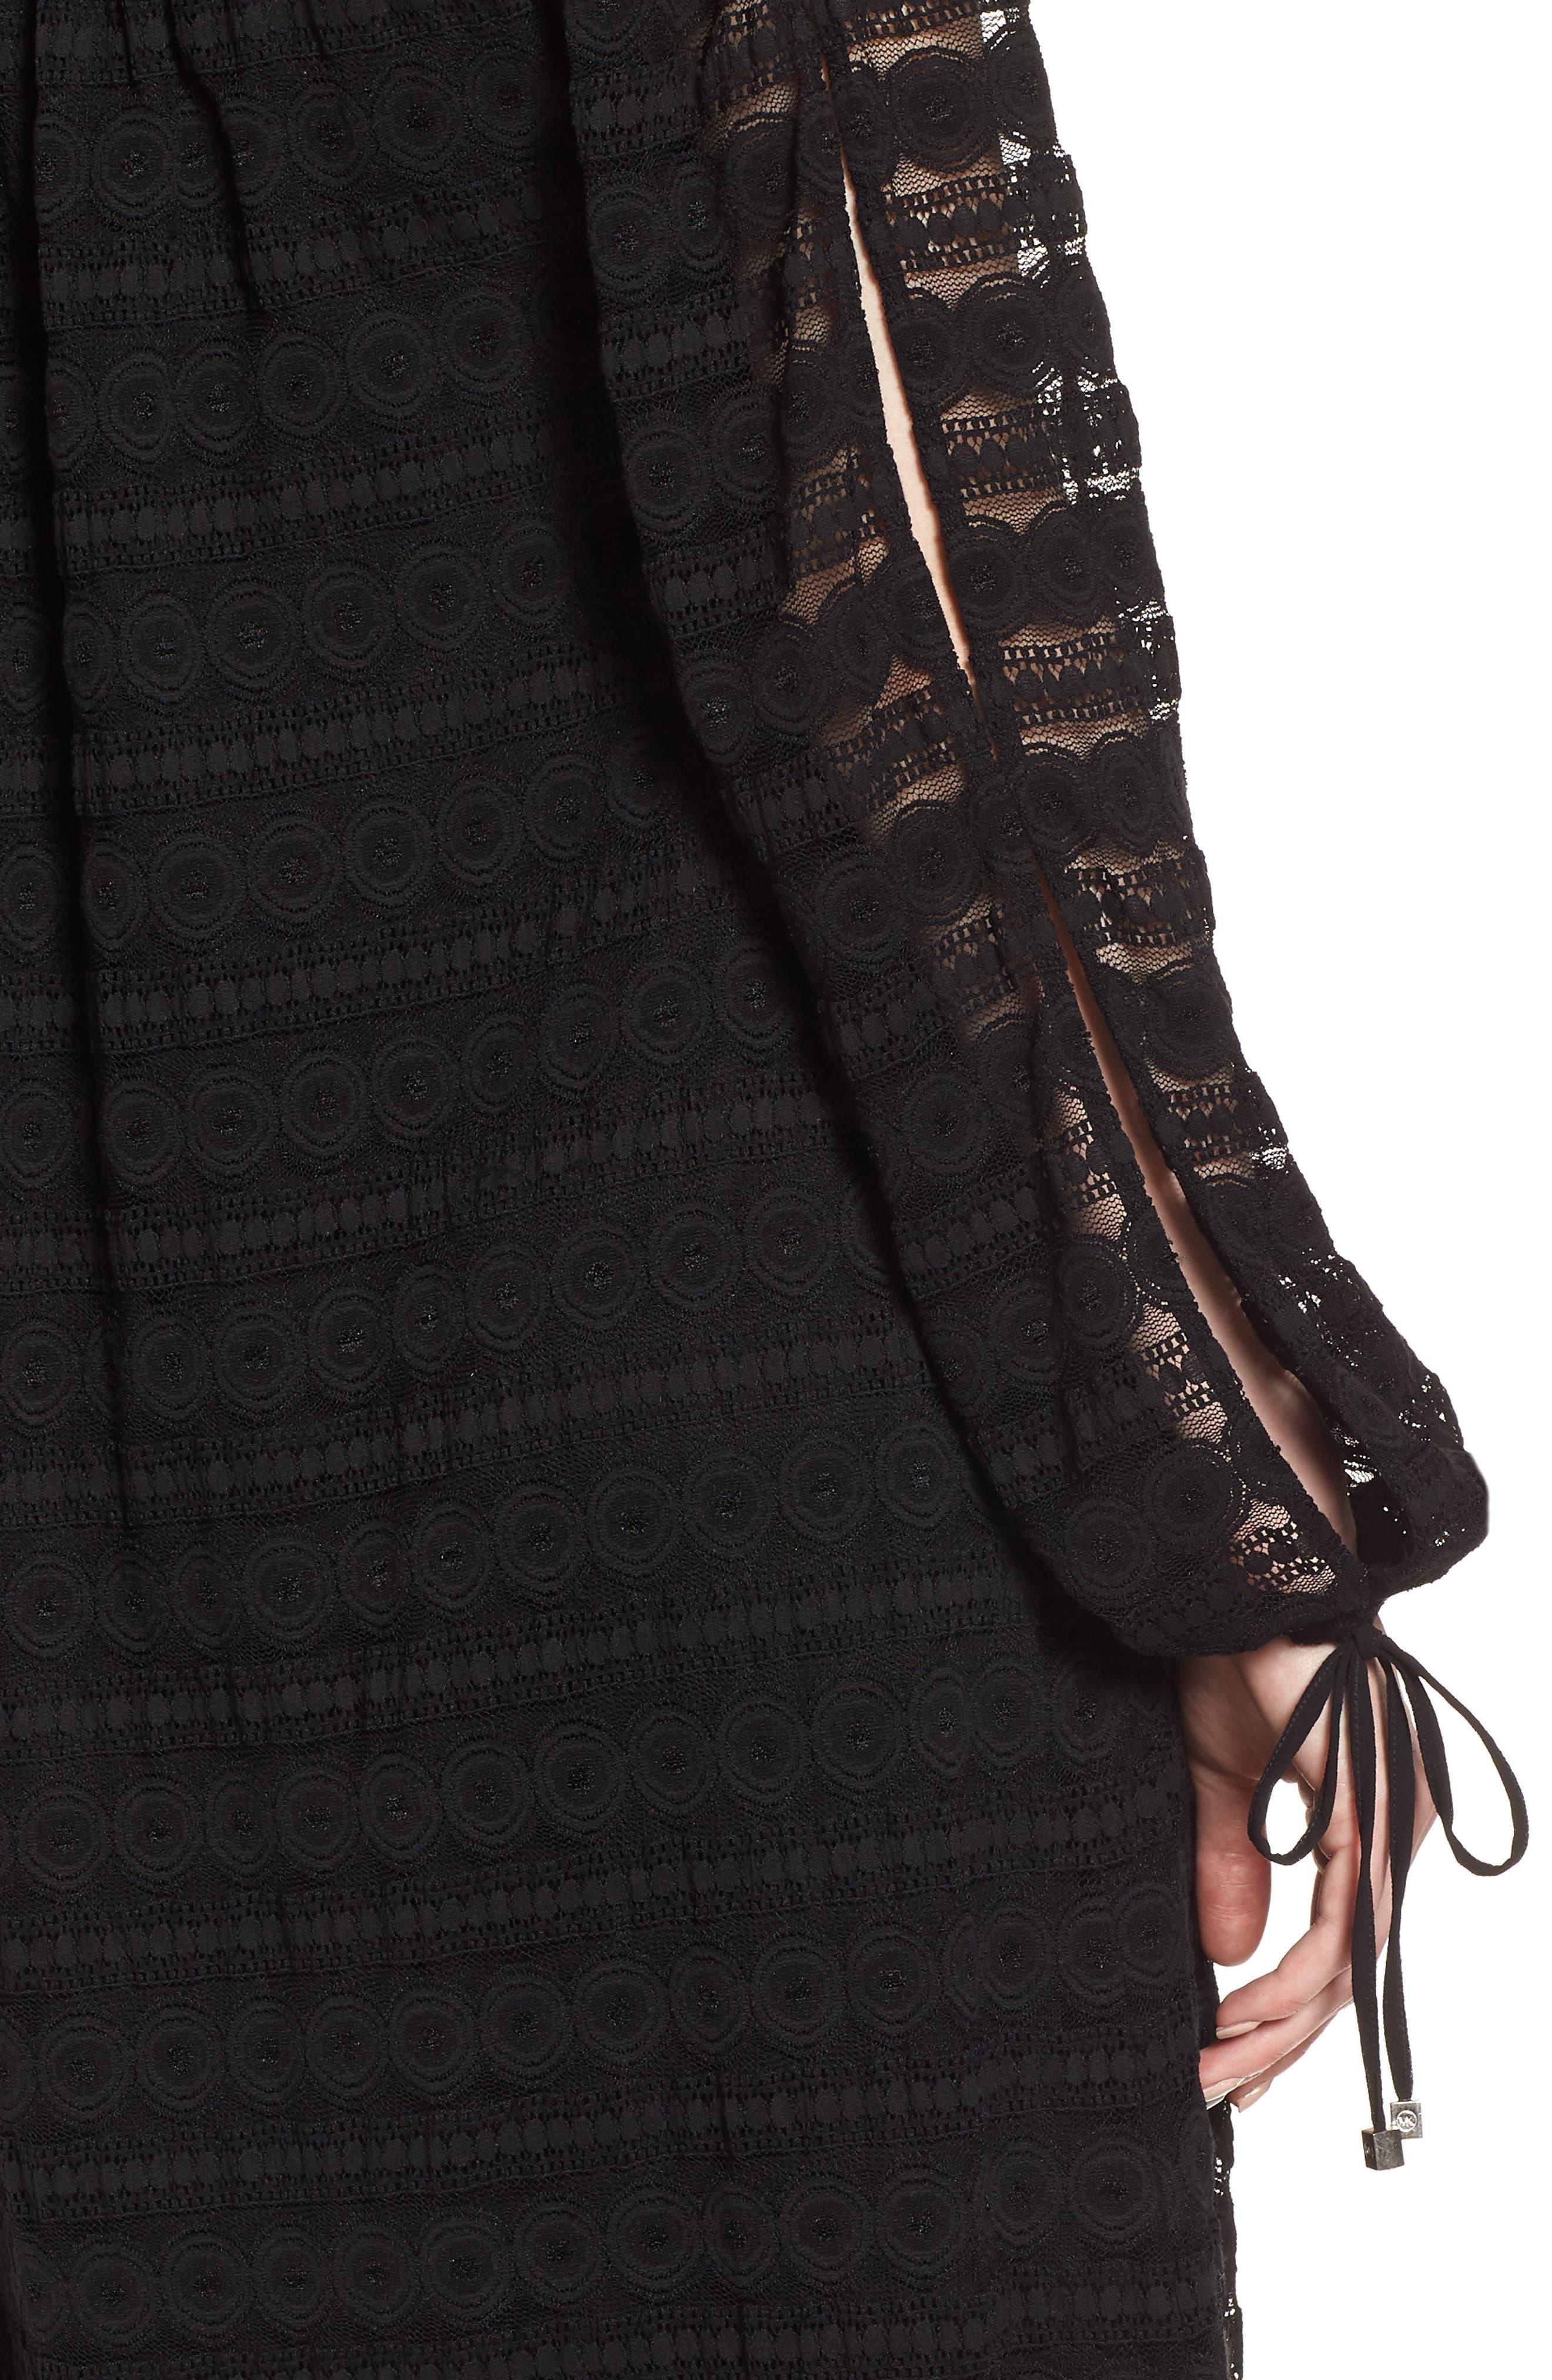 Circle Medallion Lace Off the Shoulder Dress,                             Alternate thumbnail 4, color,                             Black